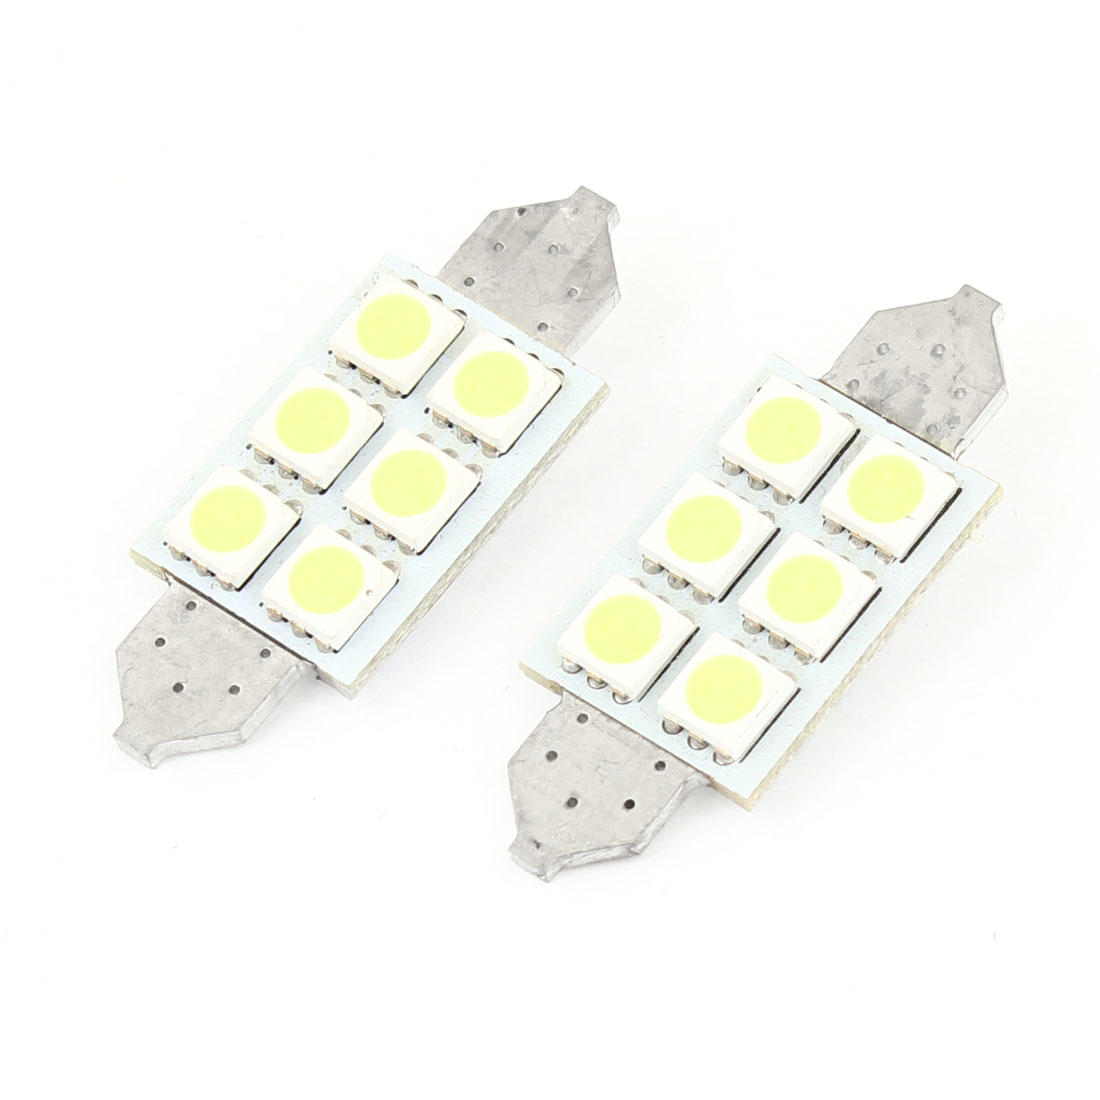 Auto No Error White 6 5050 SMD Festoon LED Light Dome Lamp Bulb 39mm 2pcs